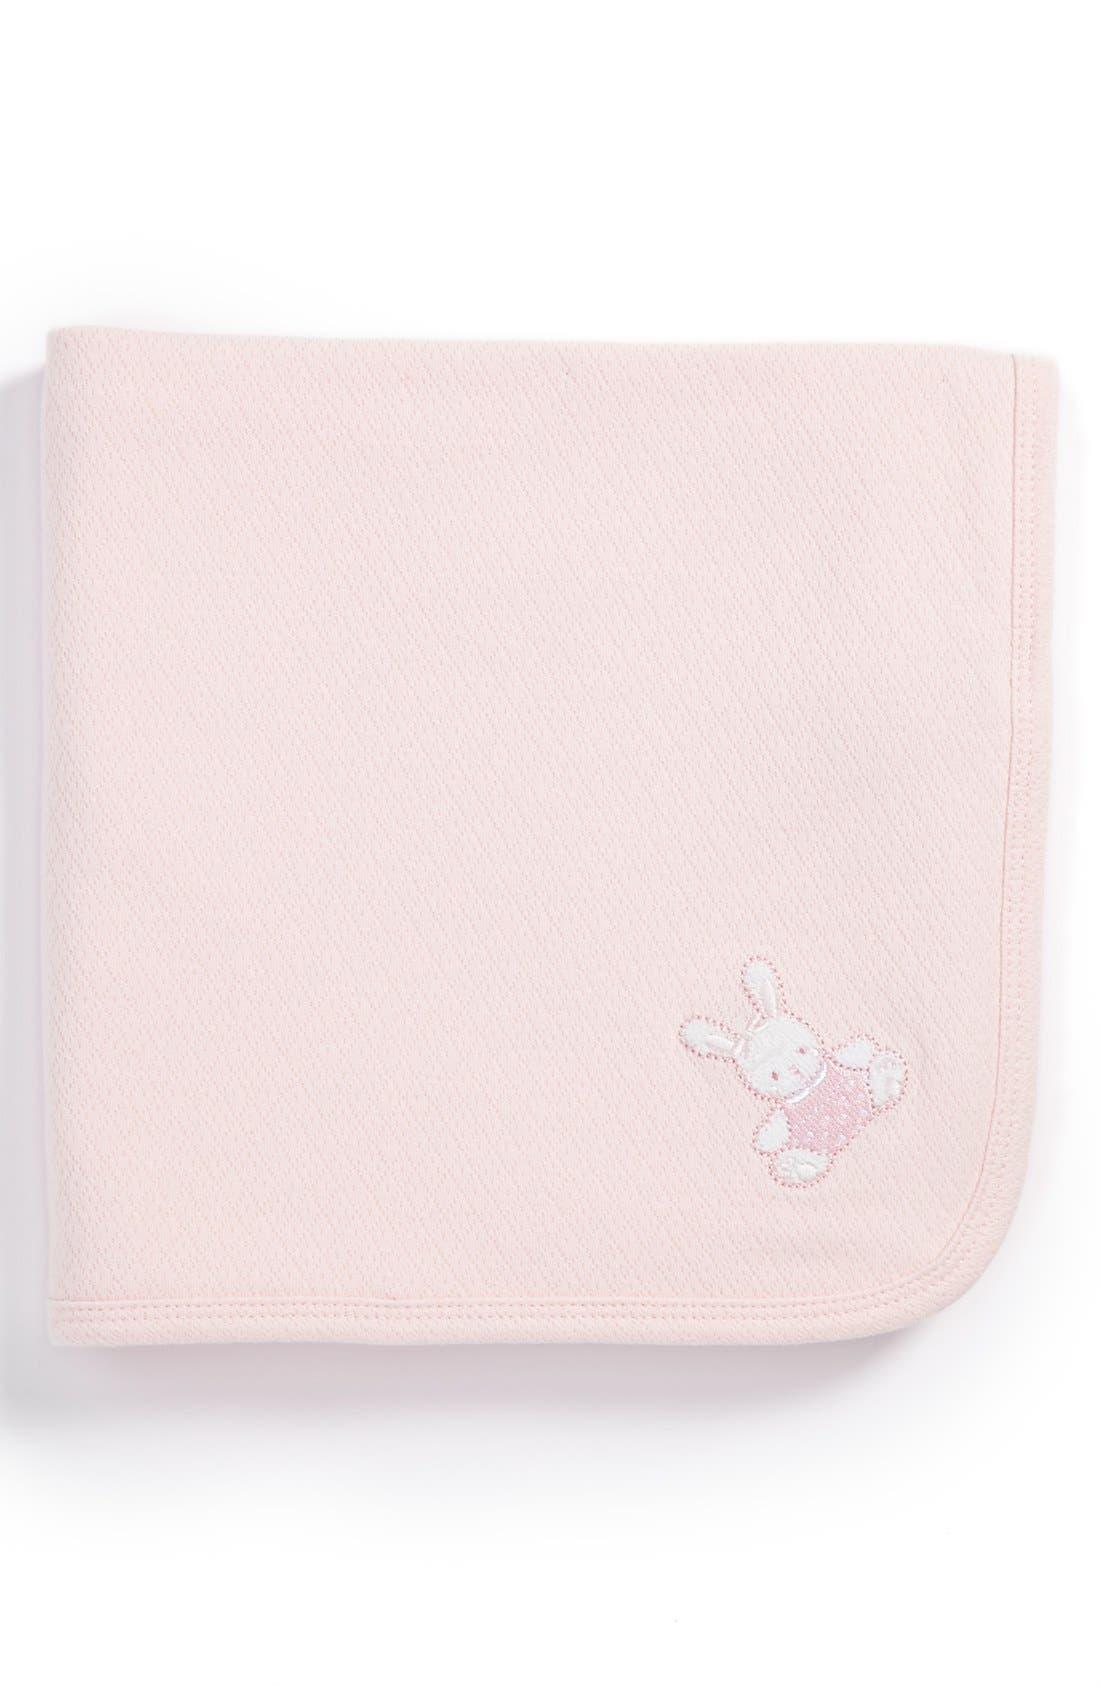 Main Image - Little Me 'Pretty Bunny' Receiving Blanket